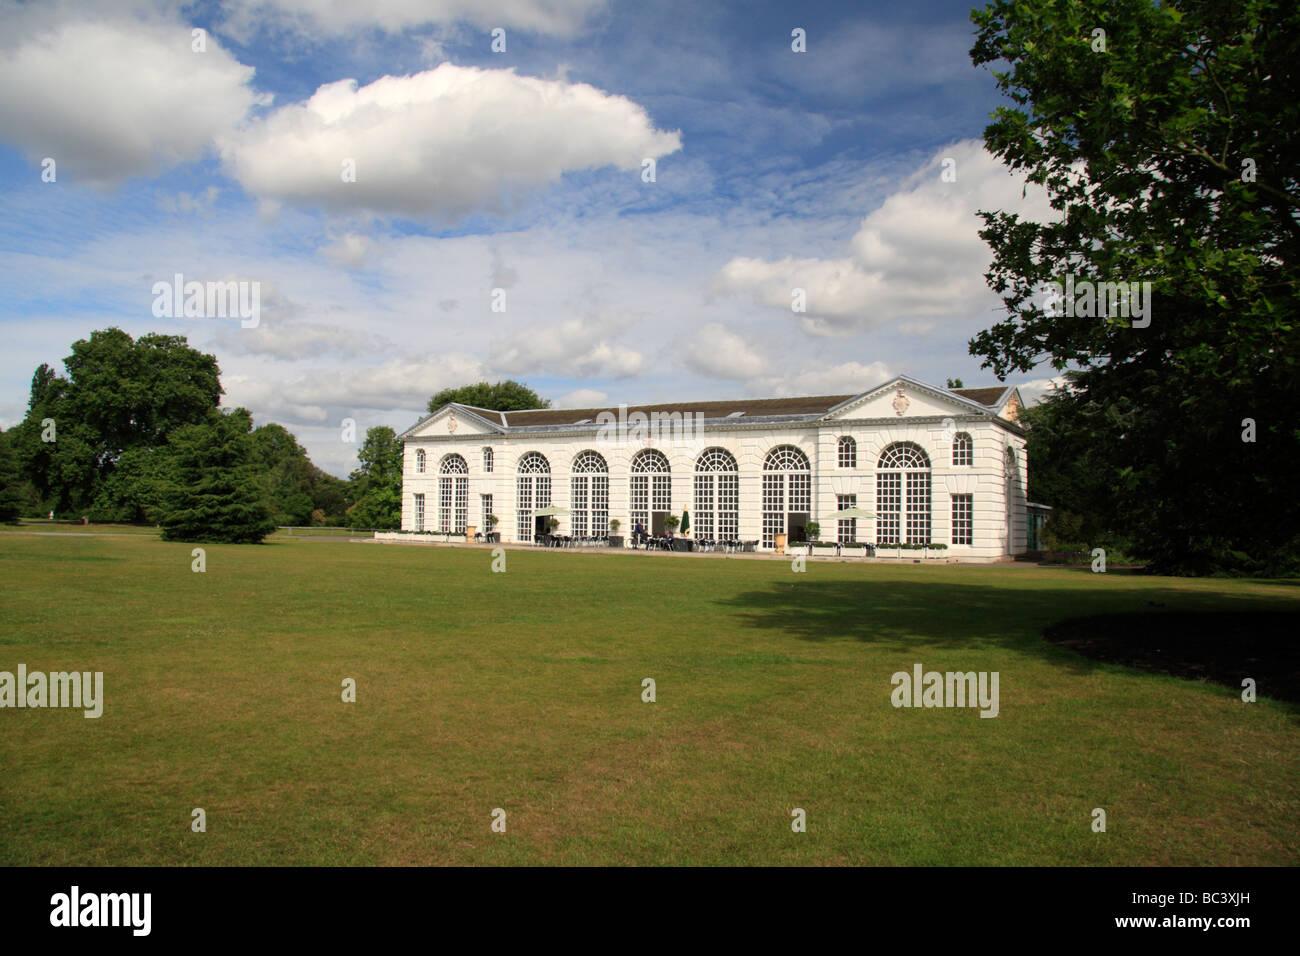 The Orangery Restaurant, The Royal Botanic Gardens, Kew, Surrey, England. - Stock Image